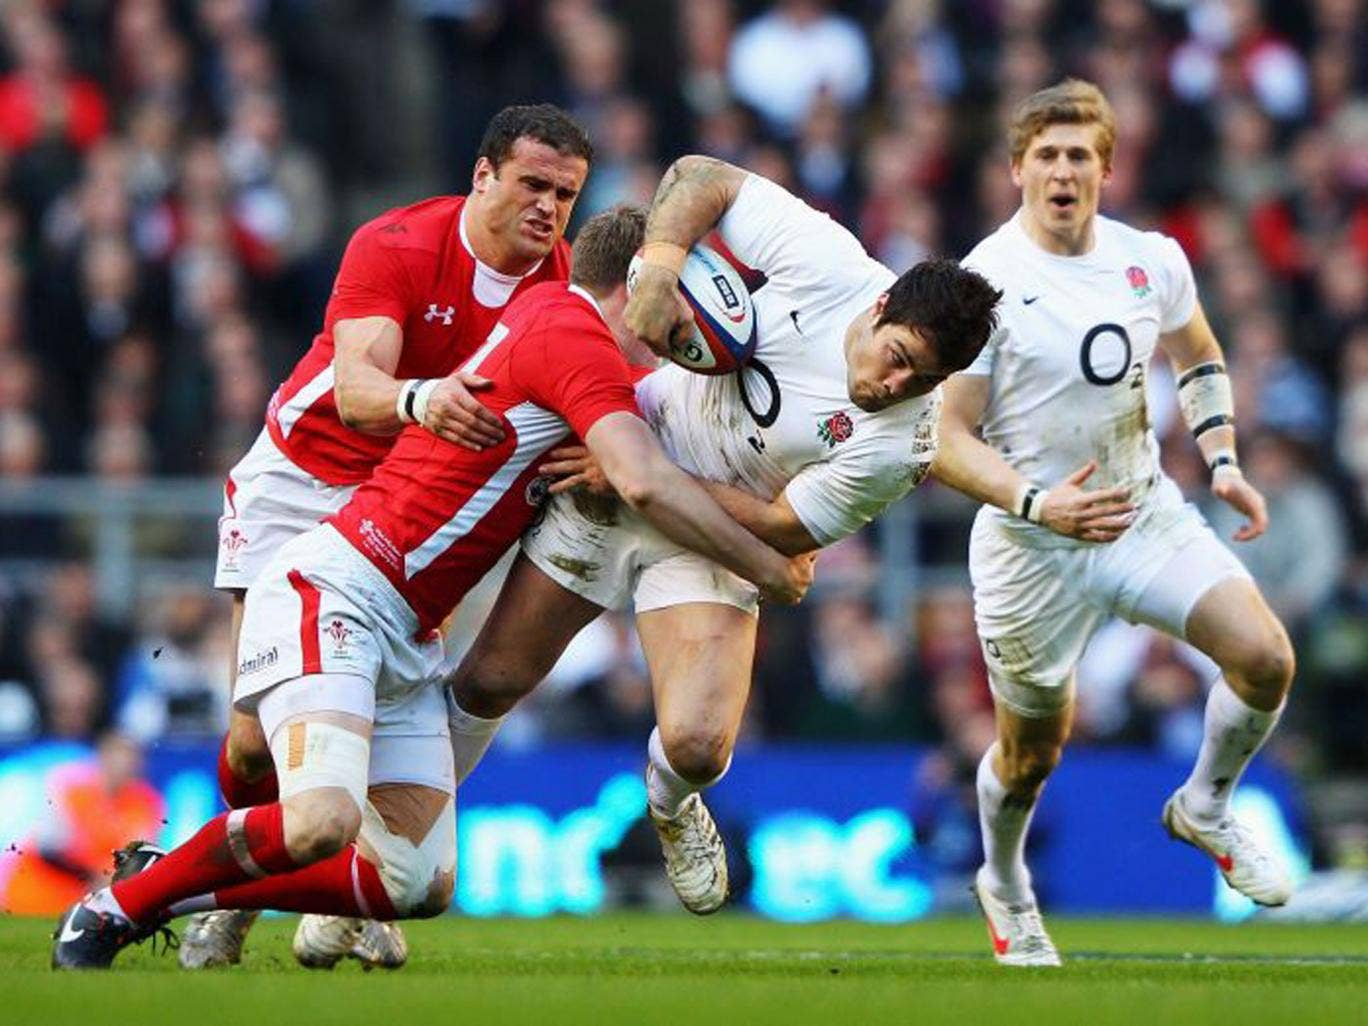 Jamie Roberts gets to grips with Brad Barritt at Twickenham last year